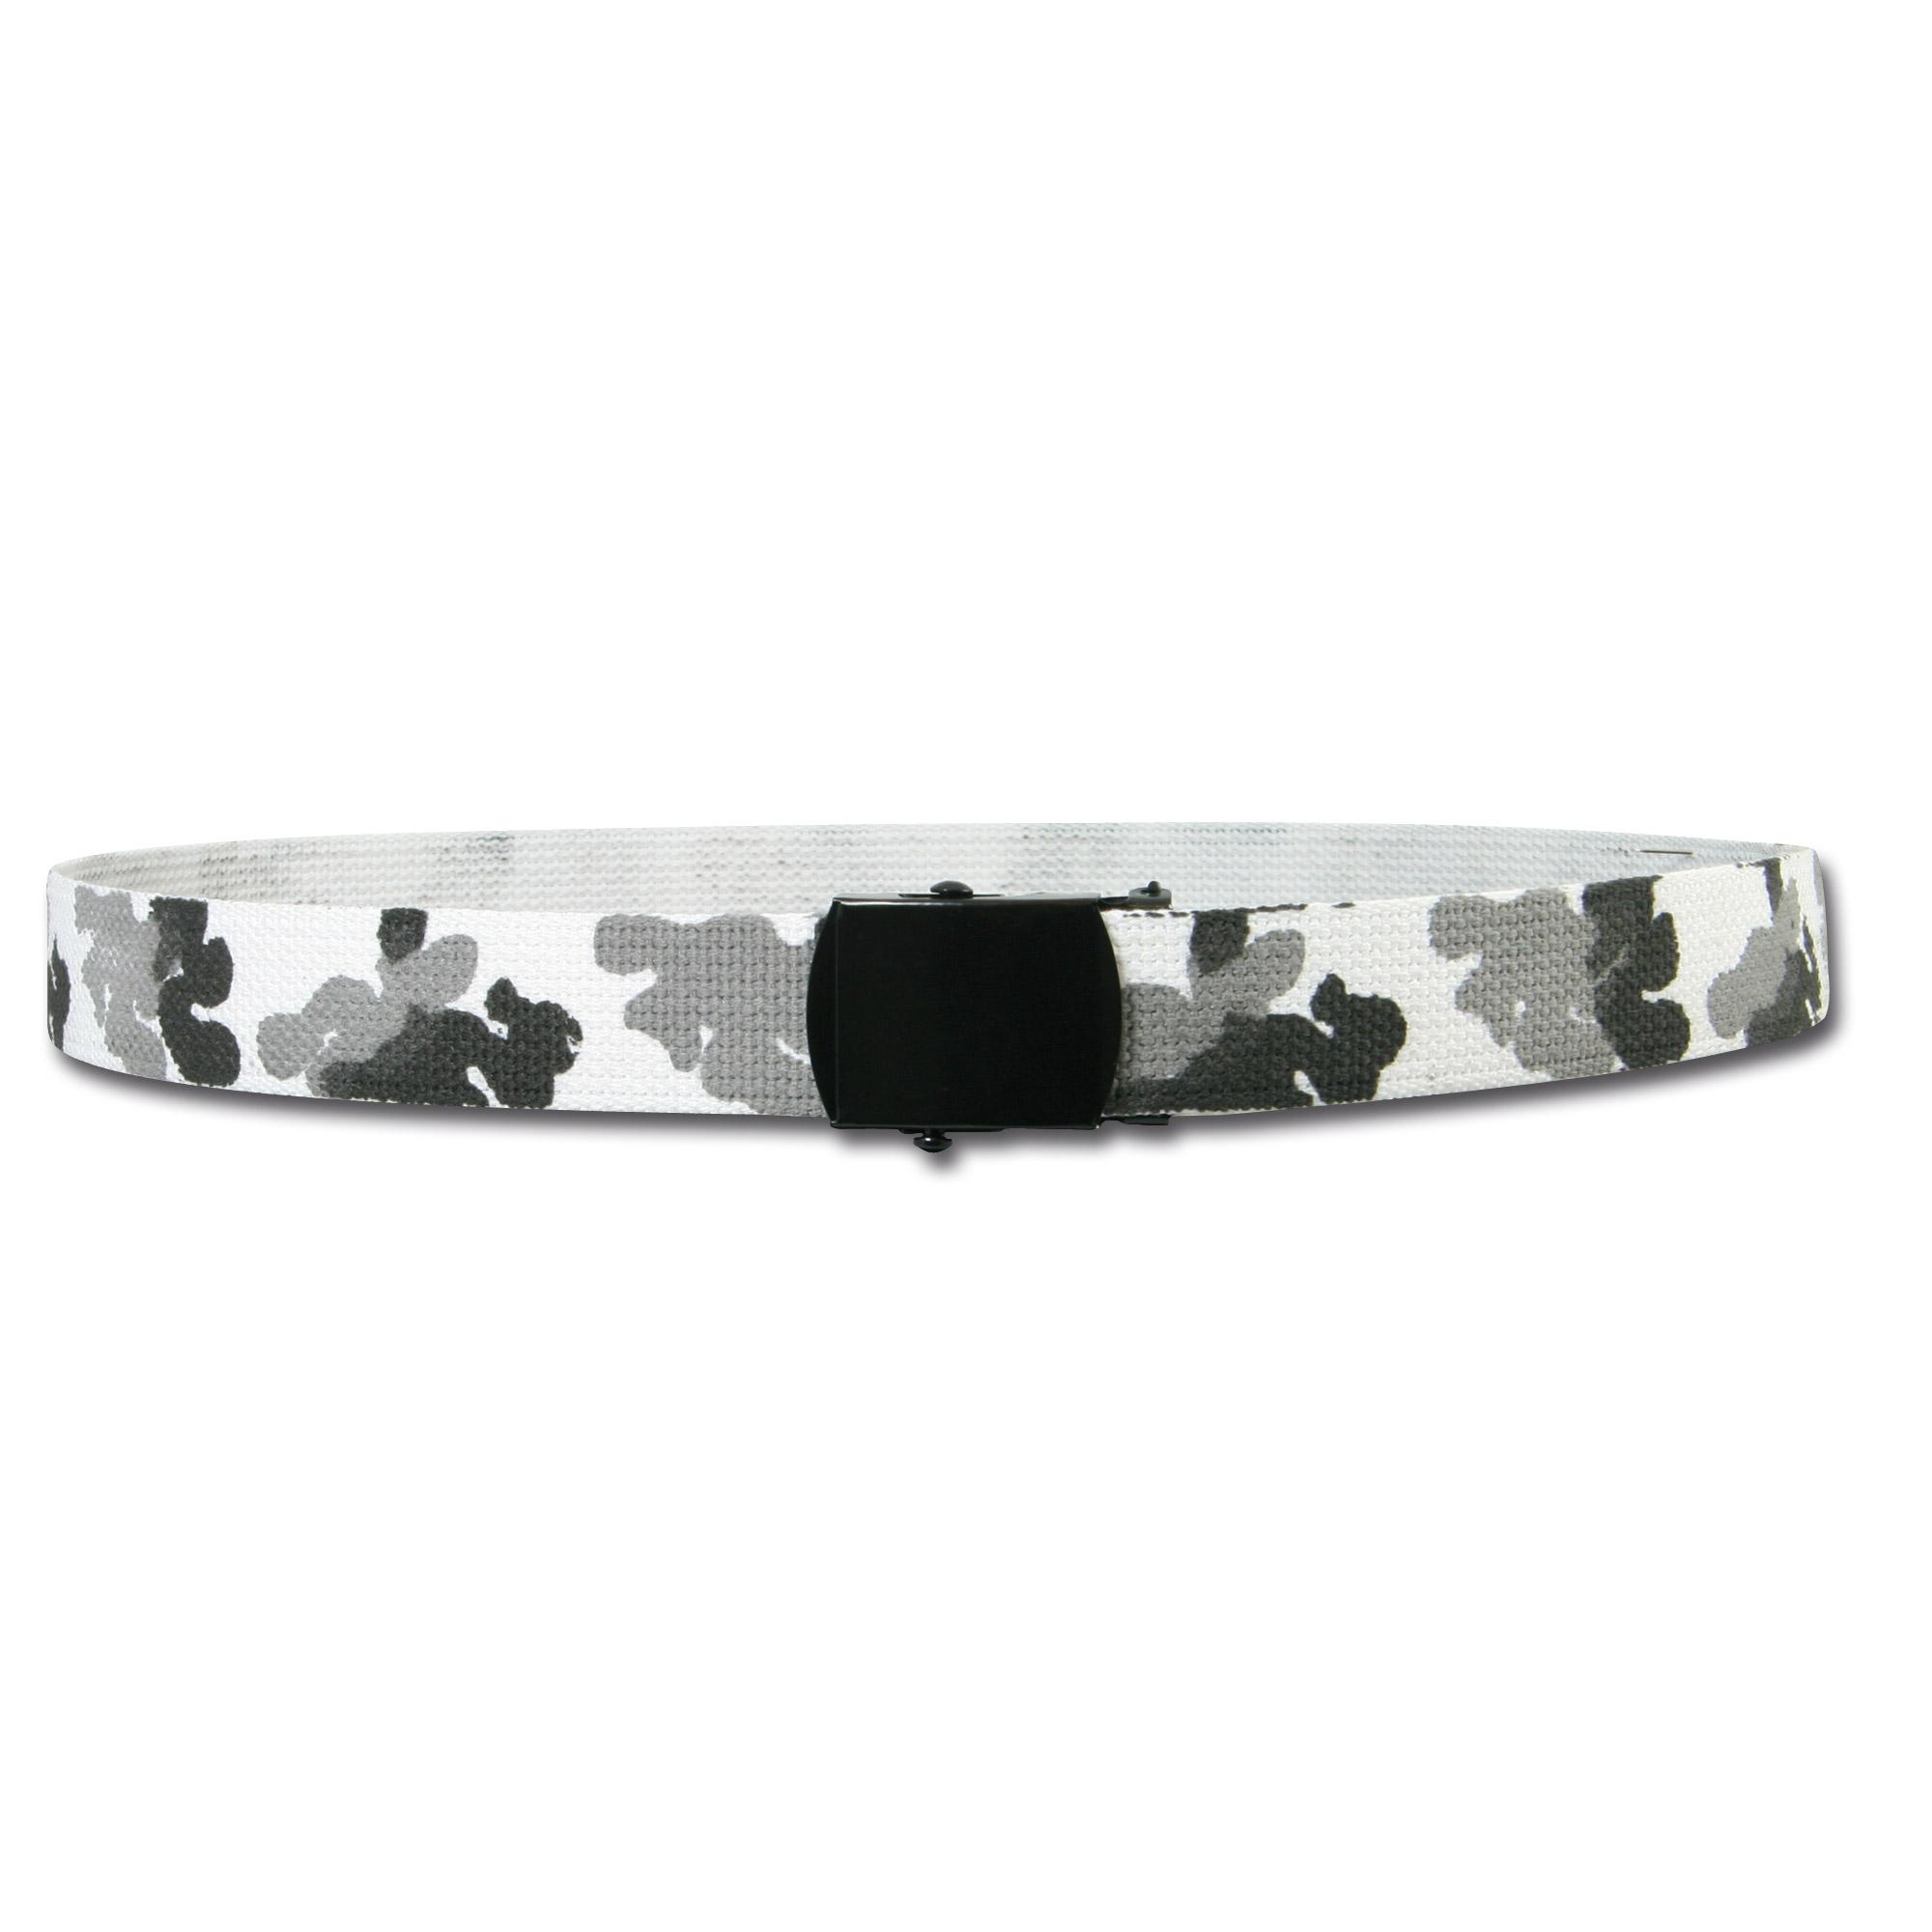 Cinturón urban-camo/blanco